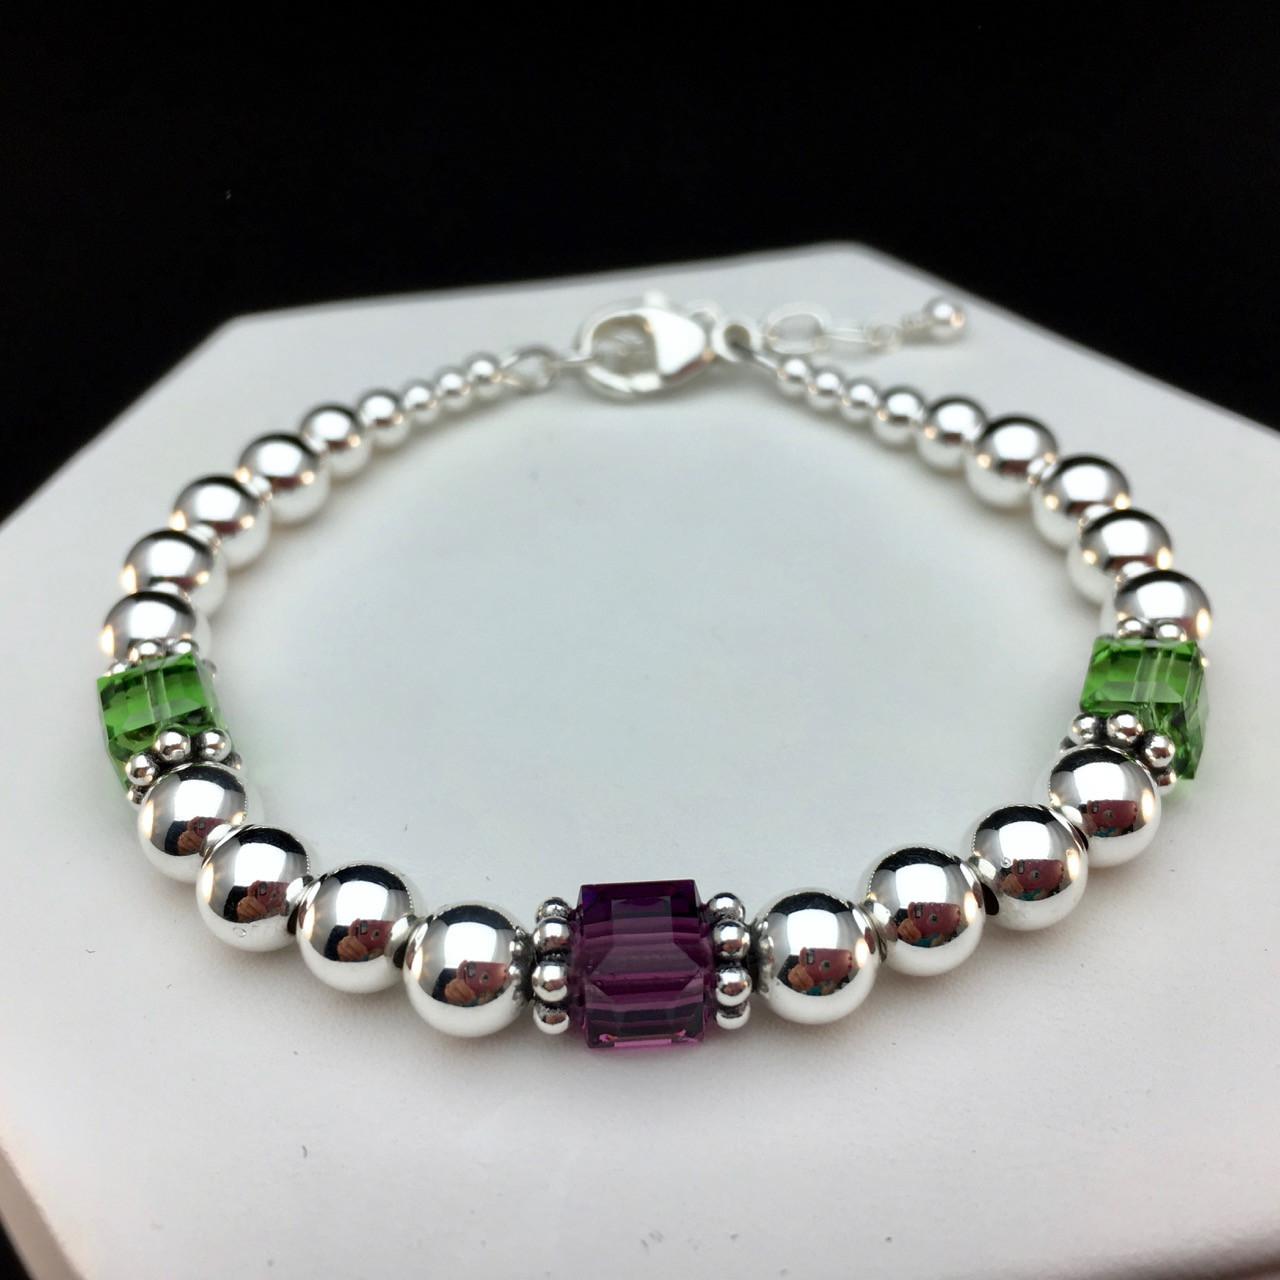 518d9f659bd071 Mother's / Grandmother's bracelet - SMH Jewelry